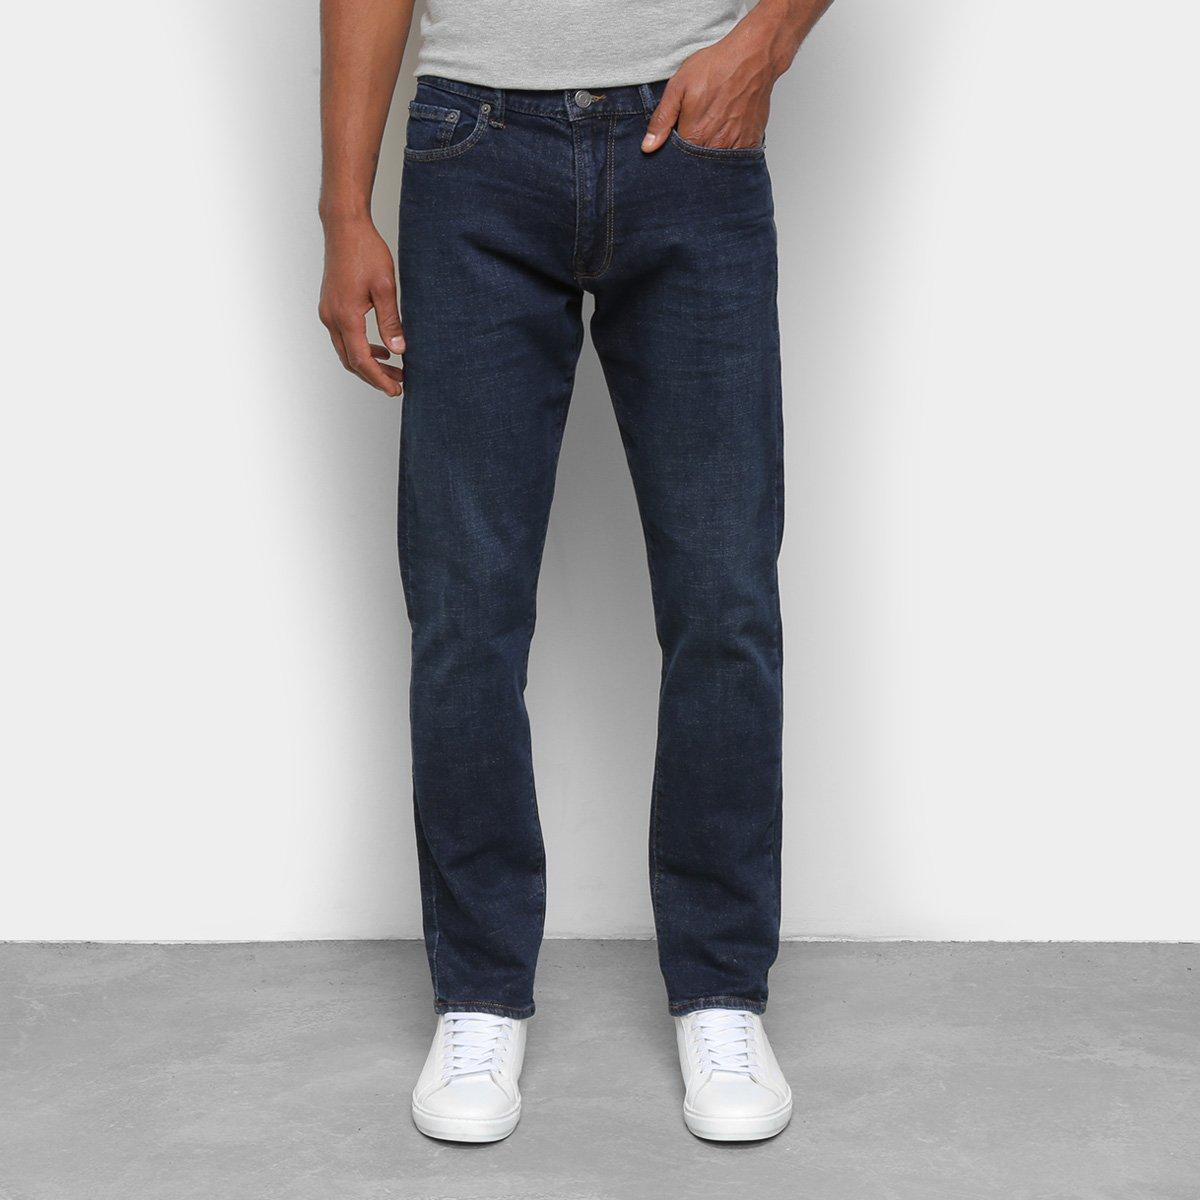 Calça Jeans GAP Regular Basic Masculina